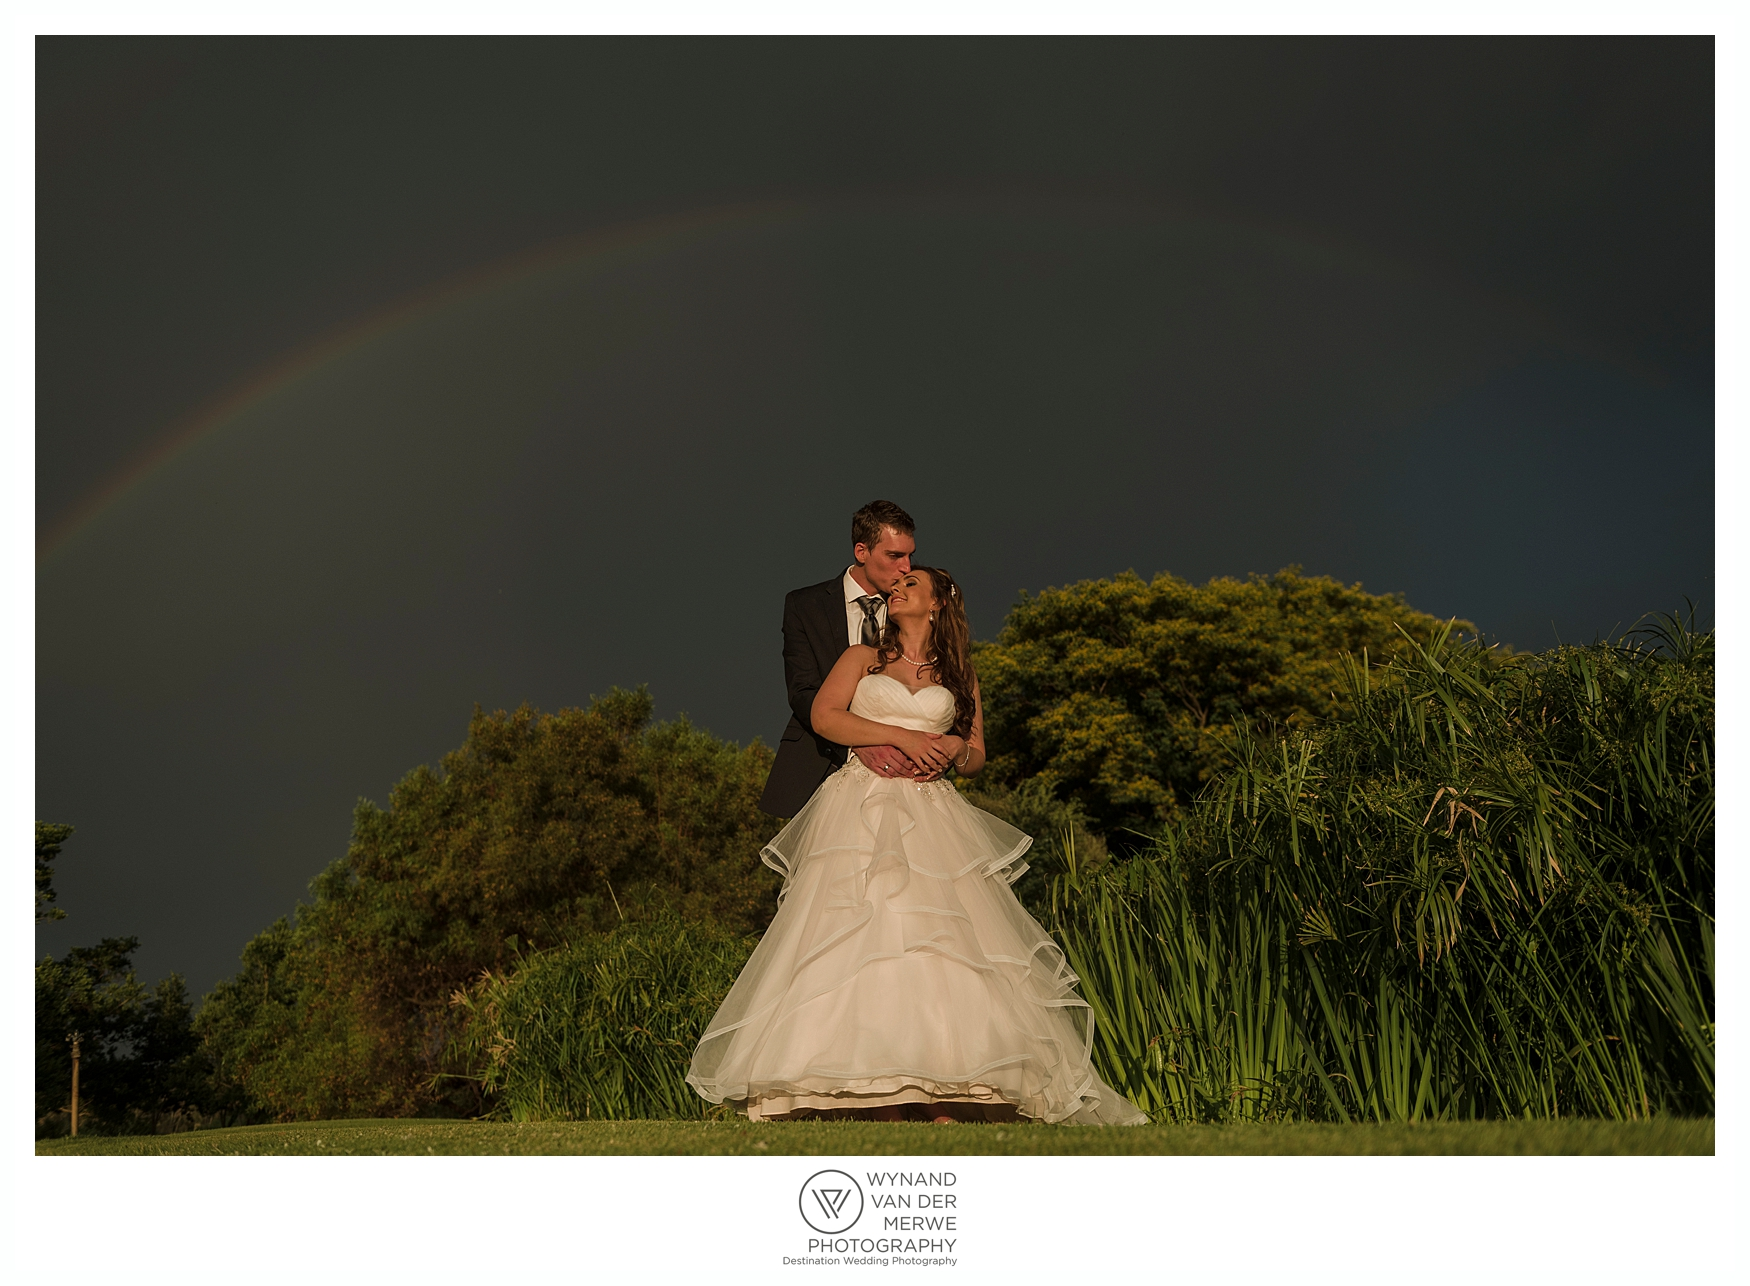 Wynandvandermerwe ryan natalia wedding photography cradle valley guesthouse gauteng-480.jpg